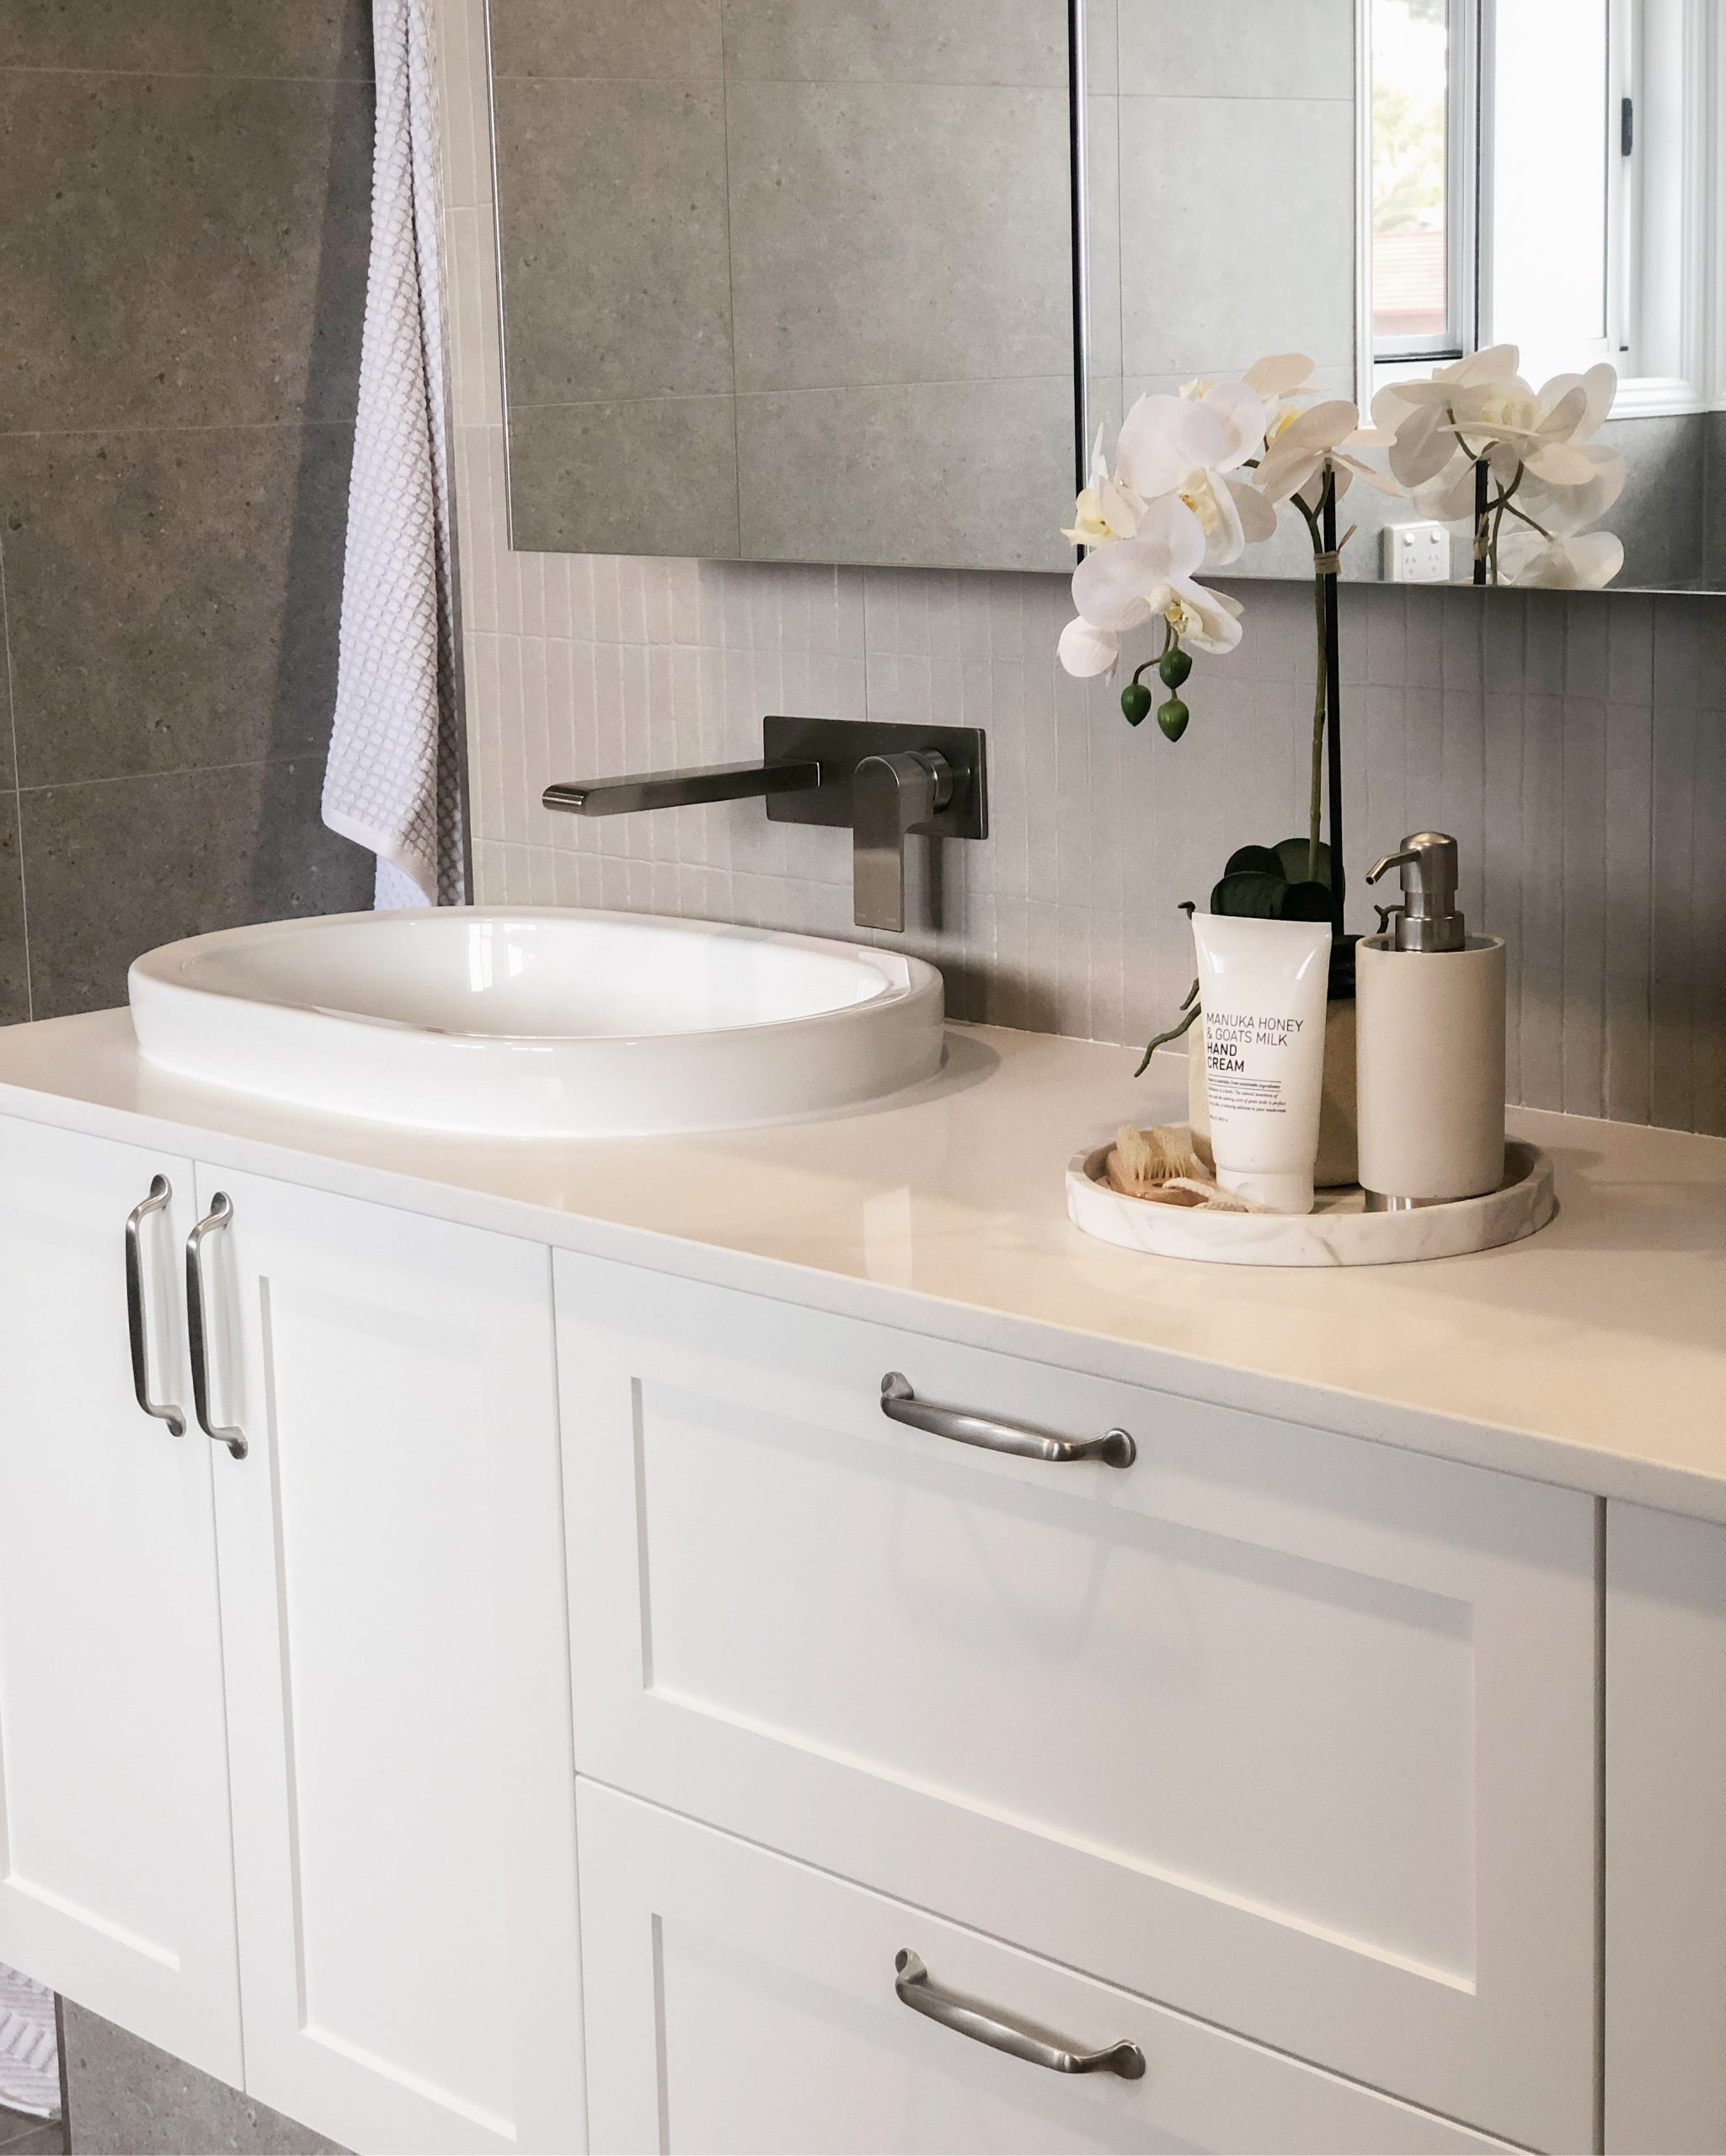 https://www.ivyandfinch.com.au/wp-content/uploads/2021/02/Bracken-Ridge-Interior-Design-Bathroom-Renovation-scaled.jpg